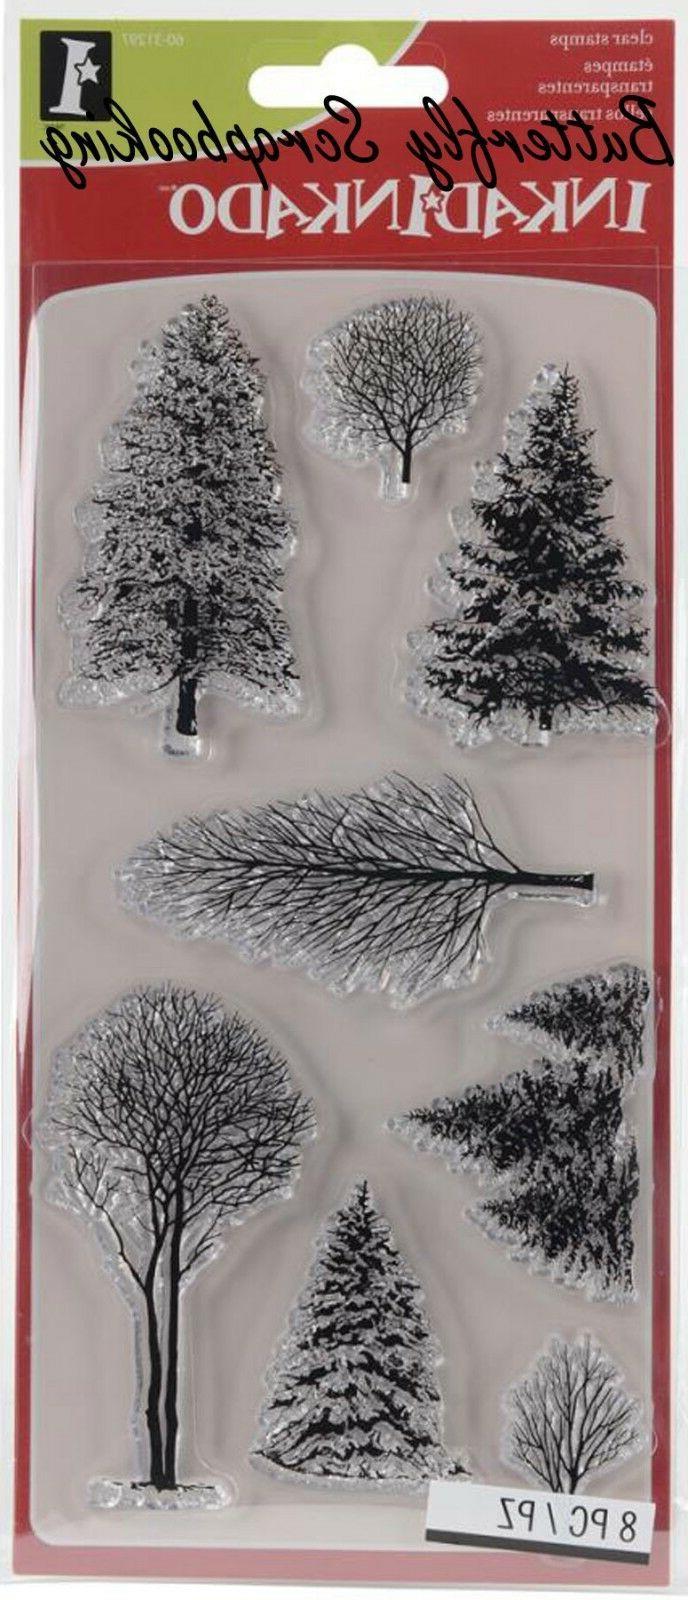 WINTER WONDERLAND TREES Clear Unmounted Rubber 8 INKADINKADO 60-31297